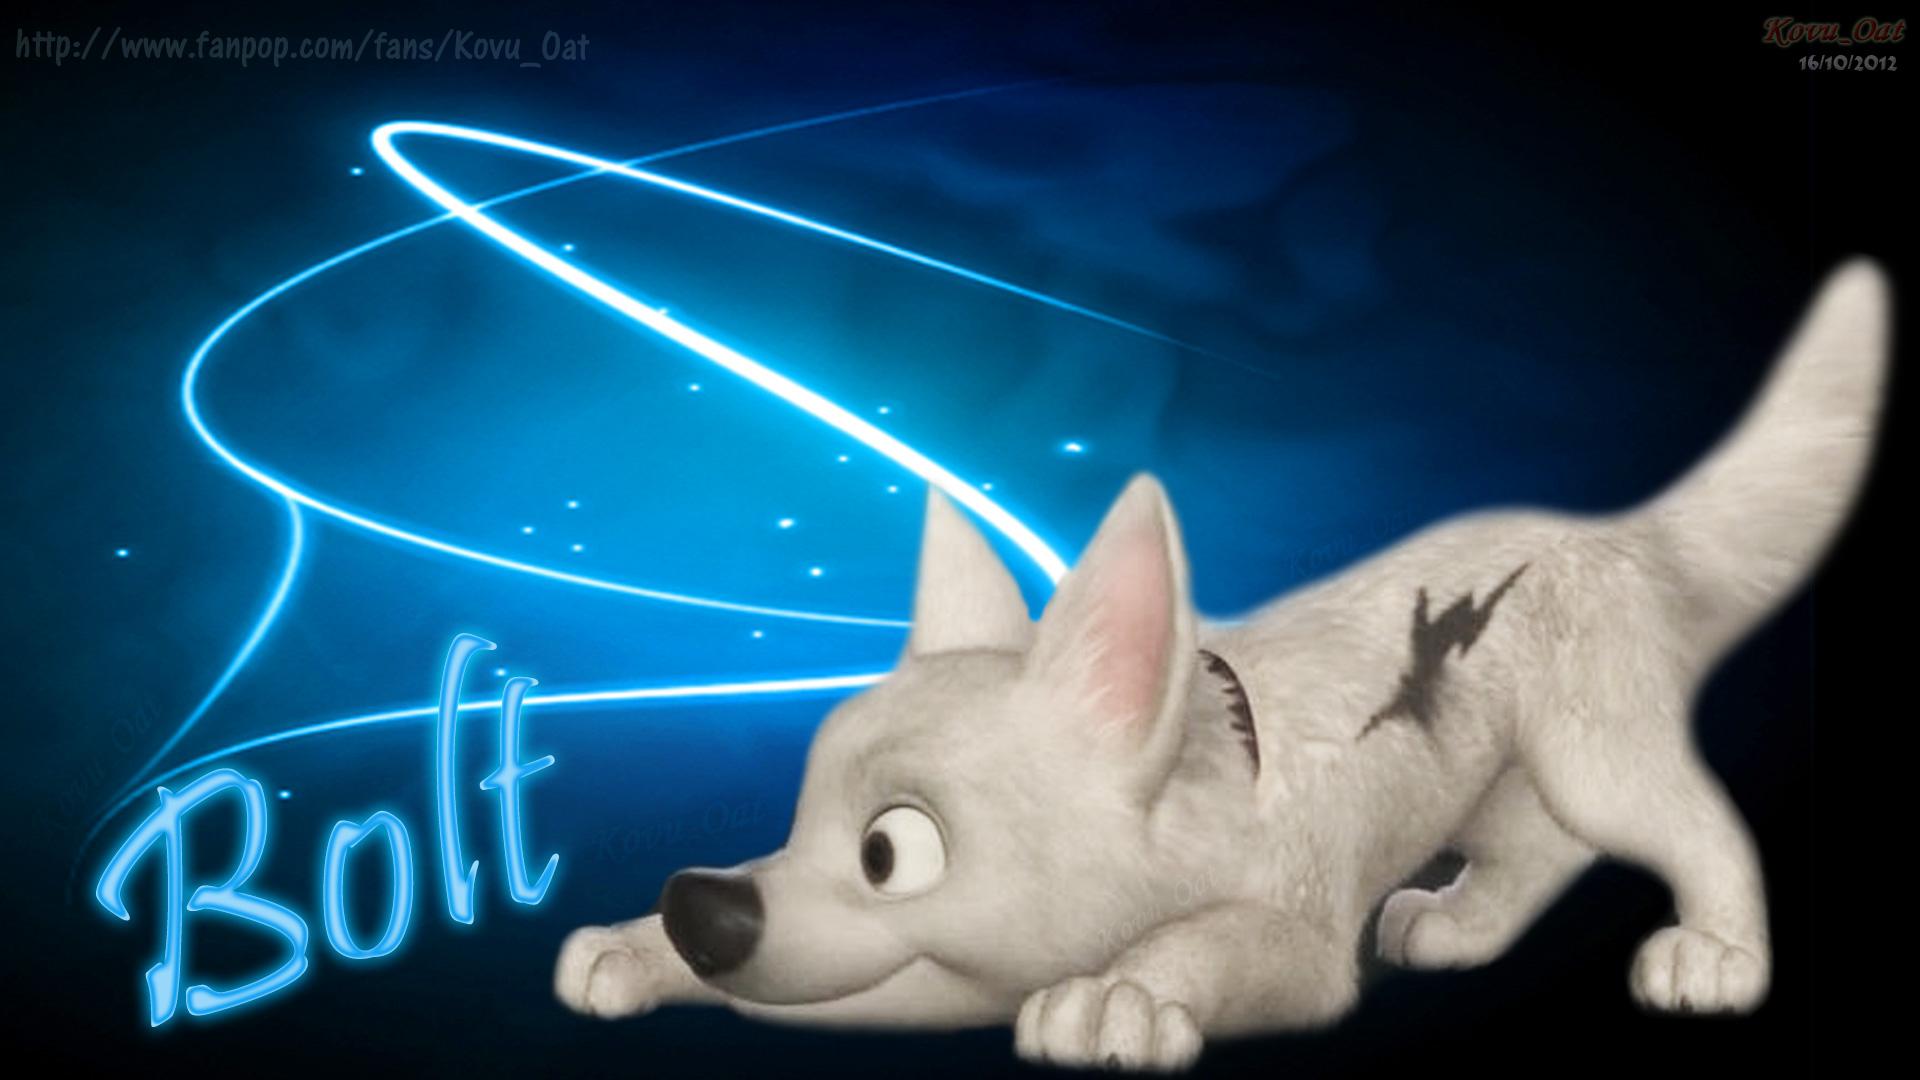 Disney Bolt Dog Cute Art Wallpaper Hd Kovu Oat Wallpaper